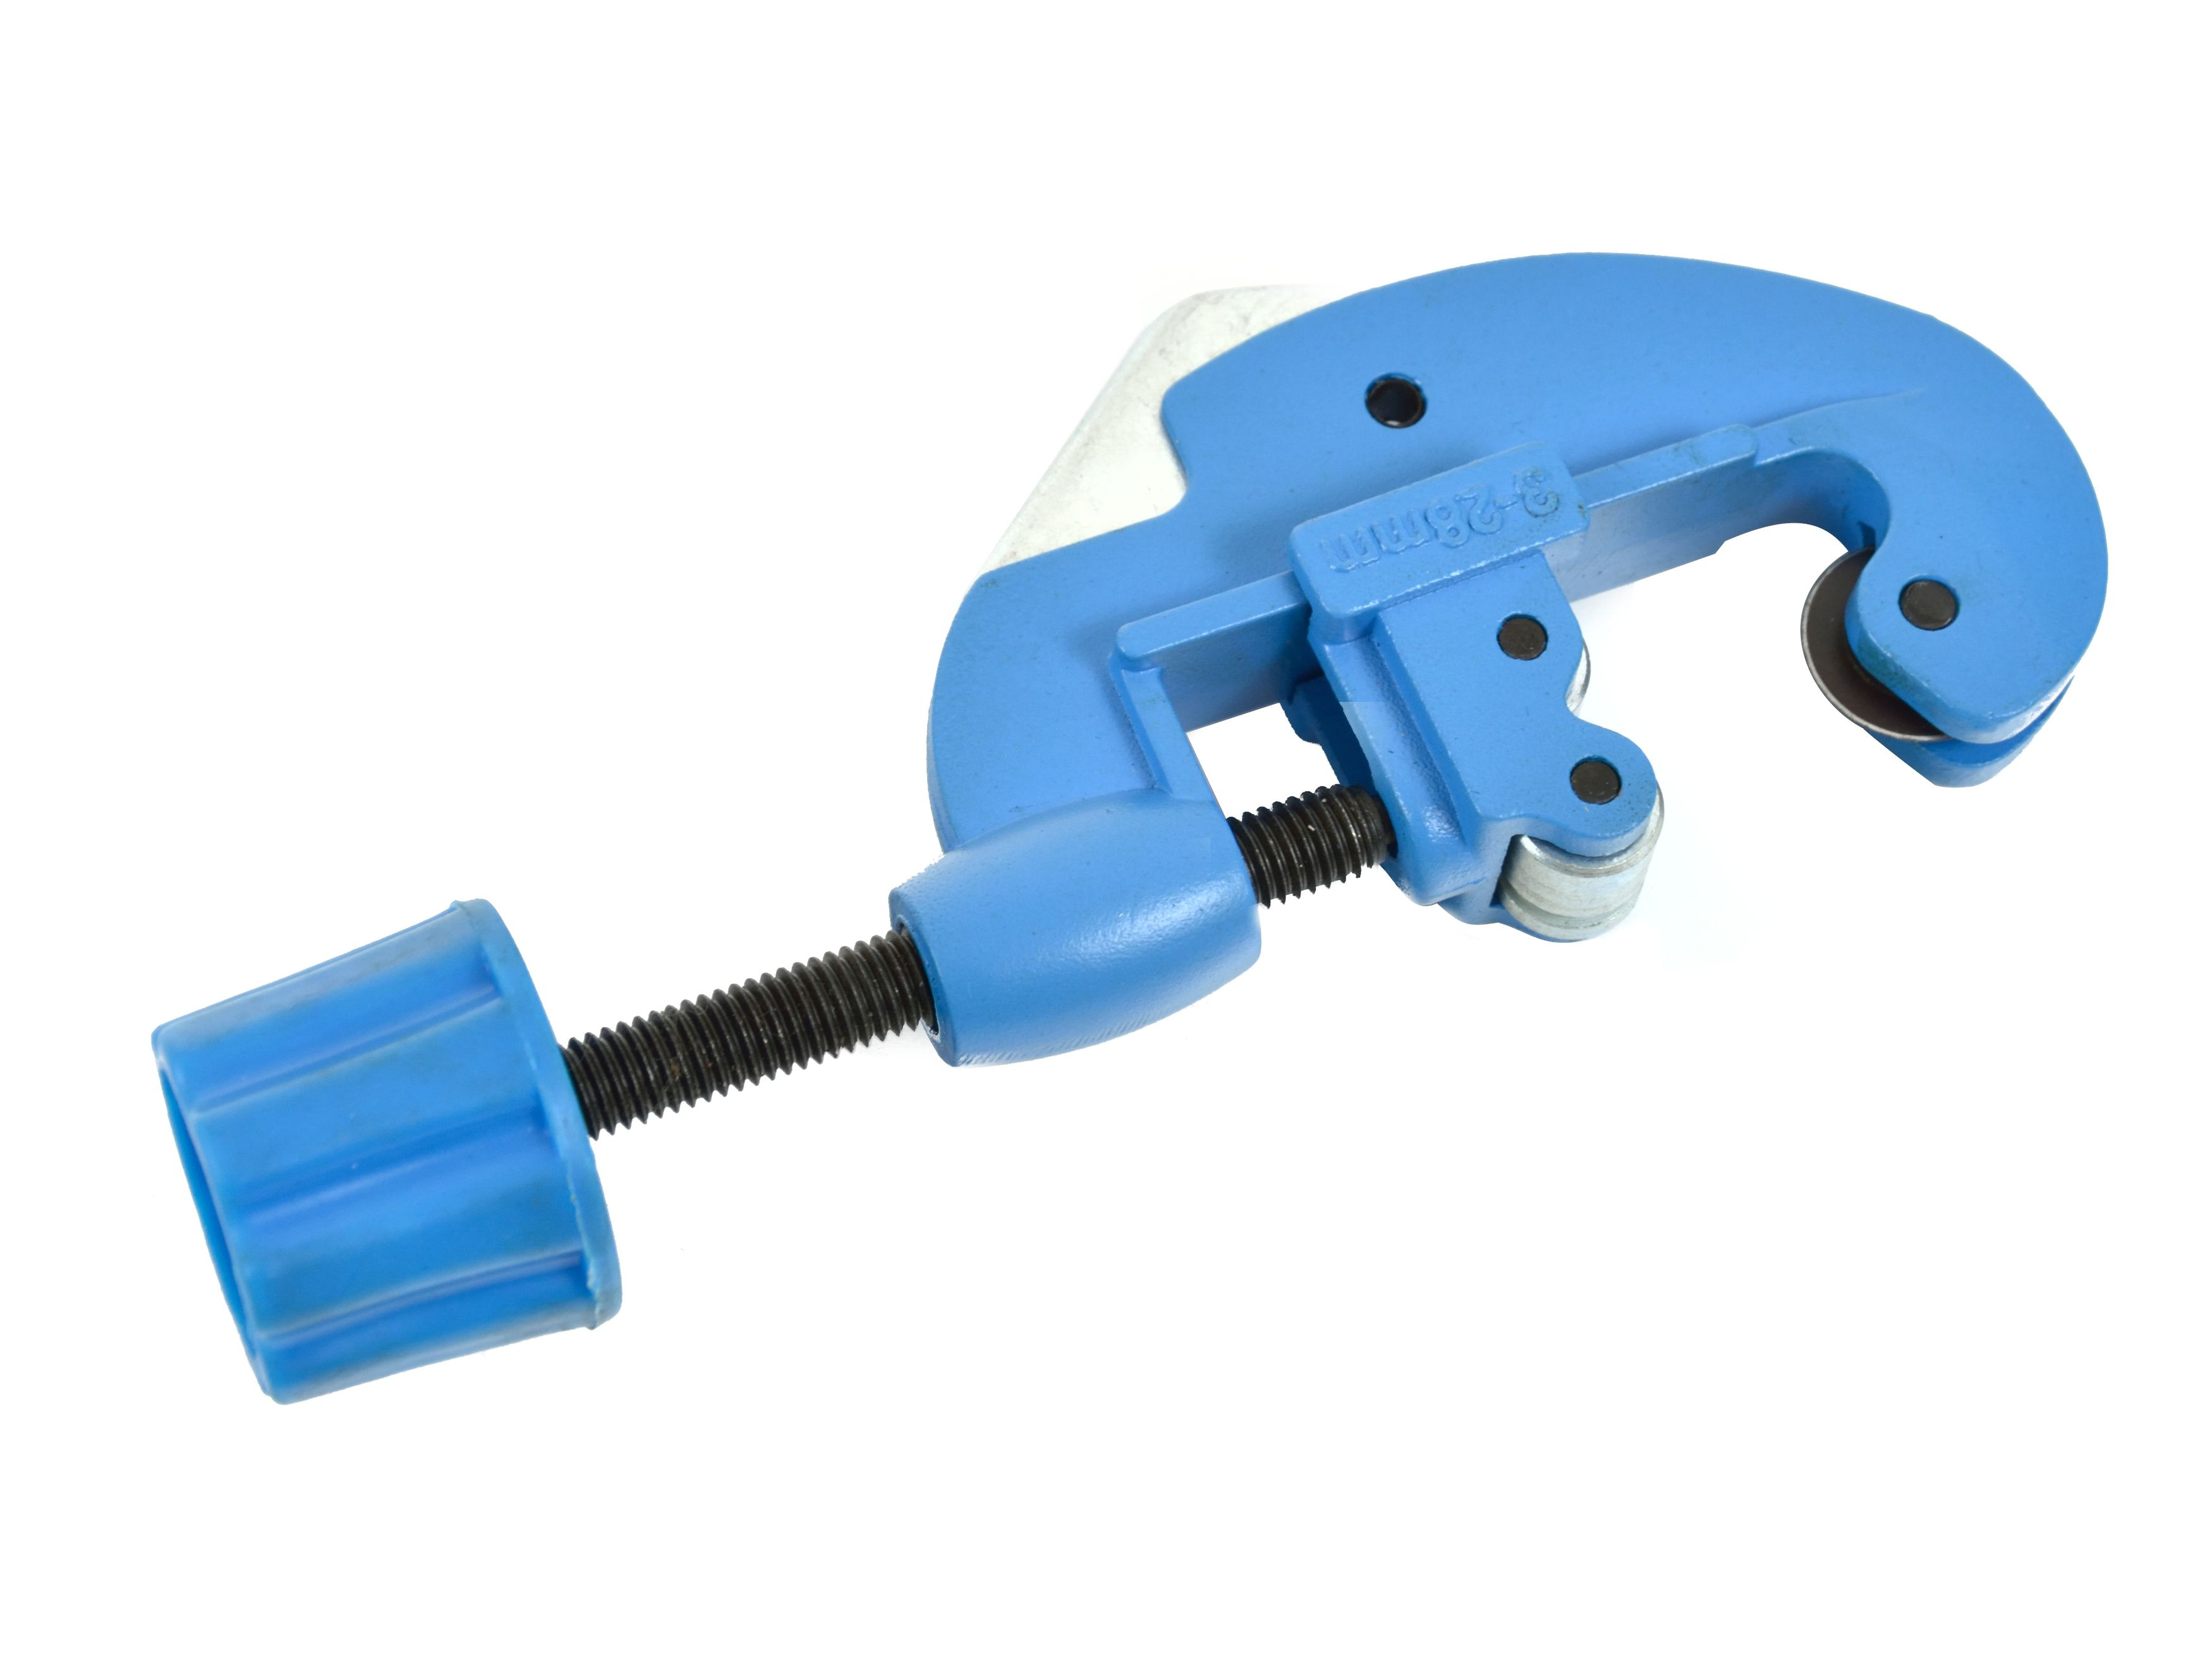 Řezač trubek s odhrotovačem, 3-28mm, GEKO